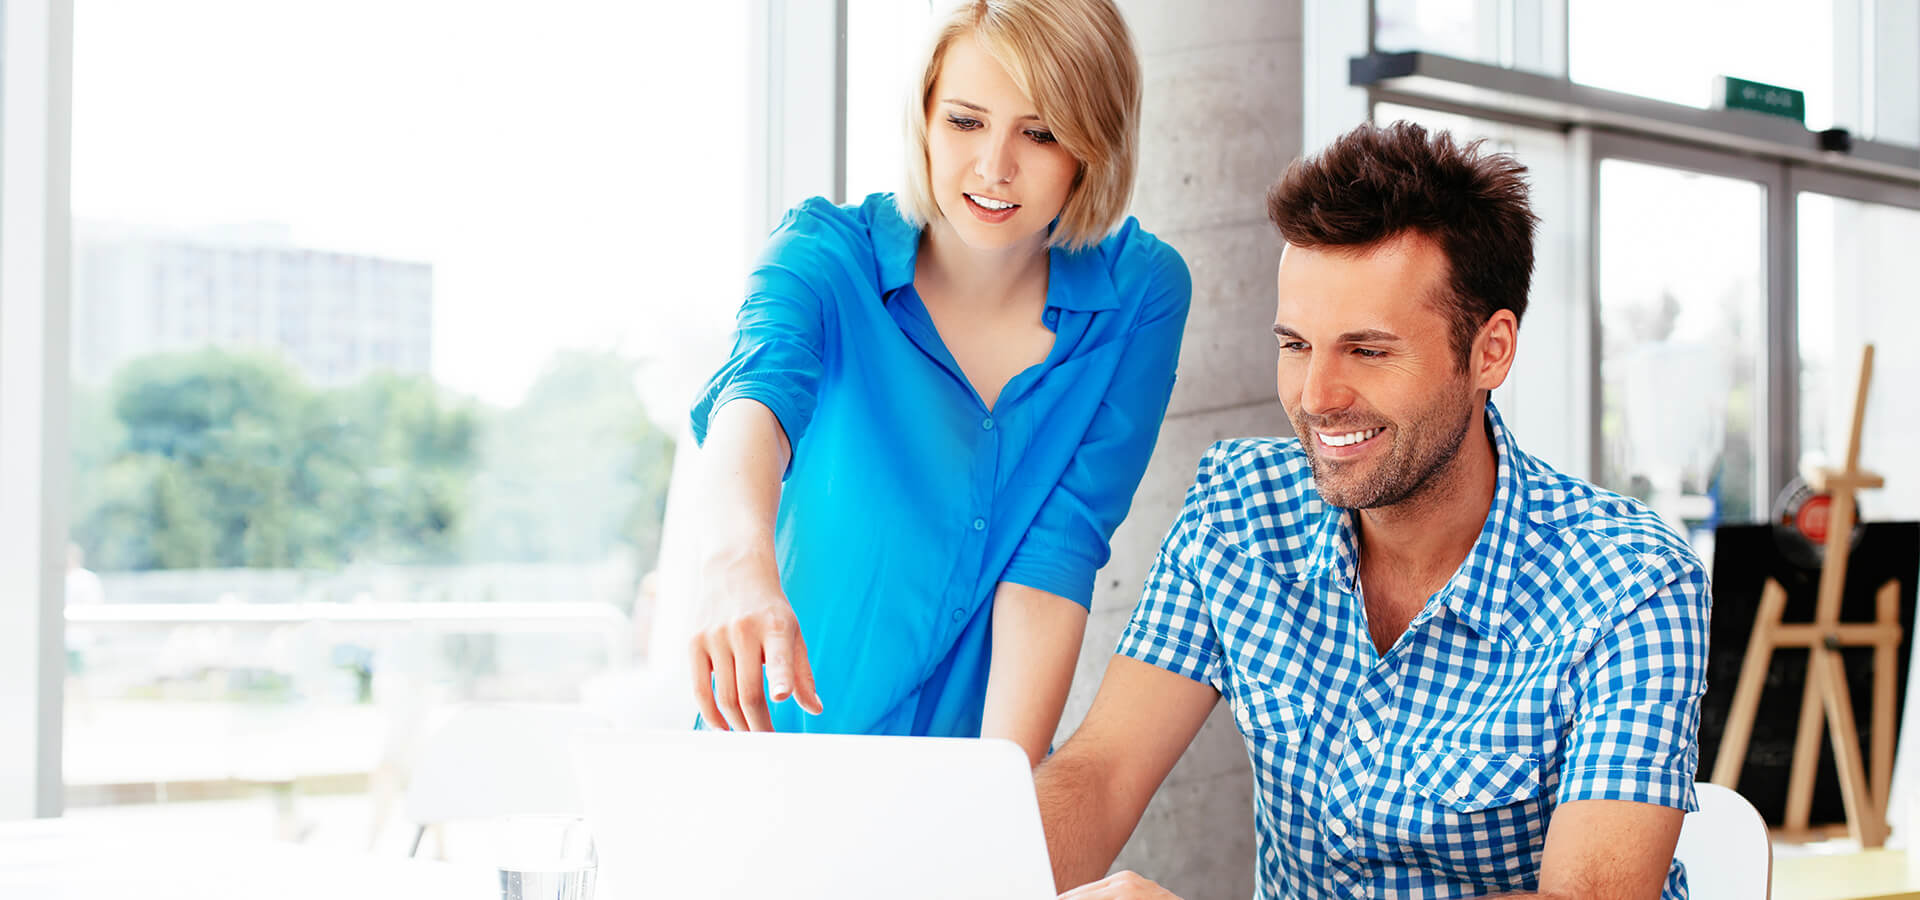 Managing an internal data server and website server